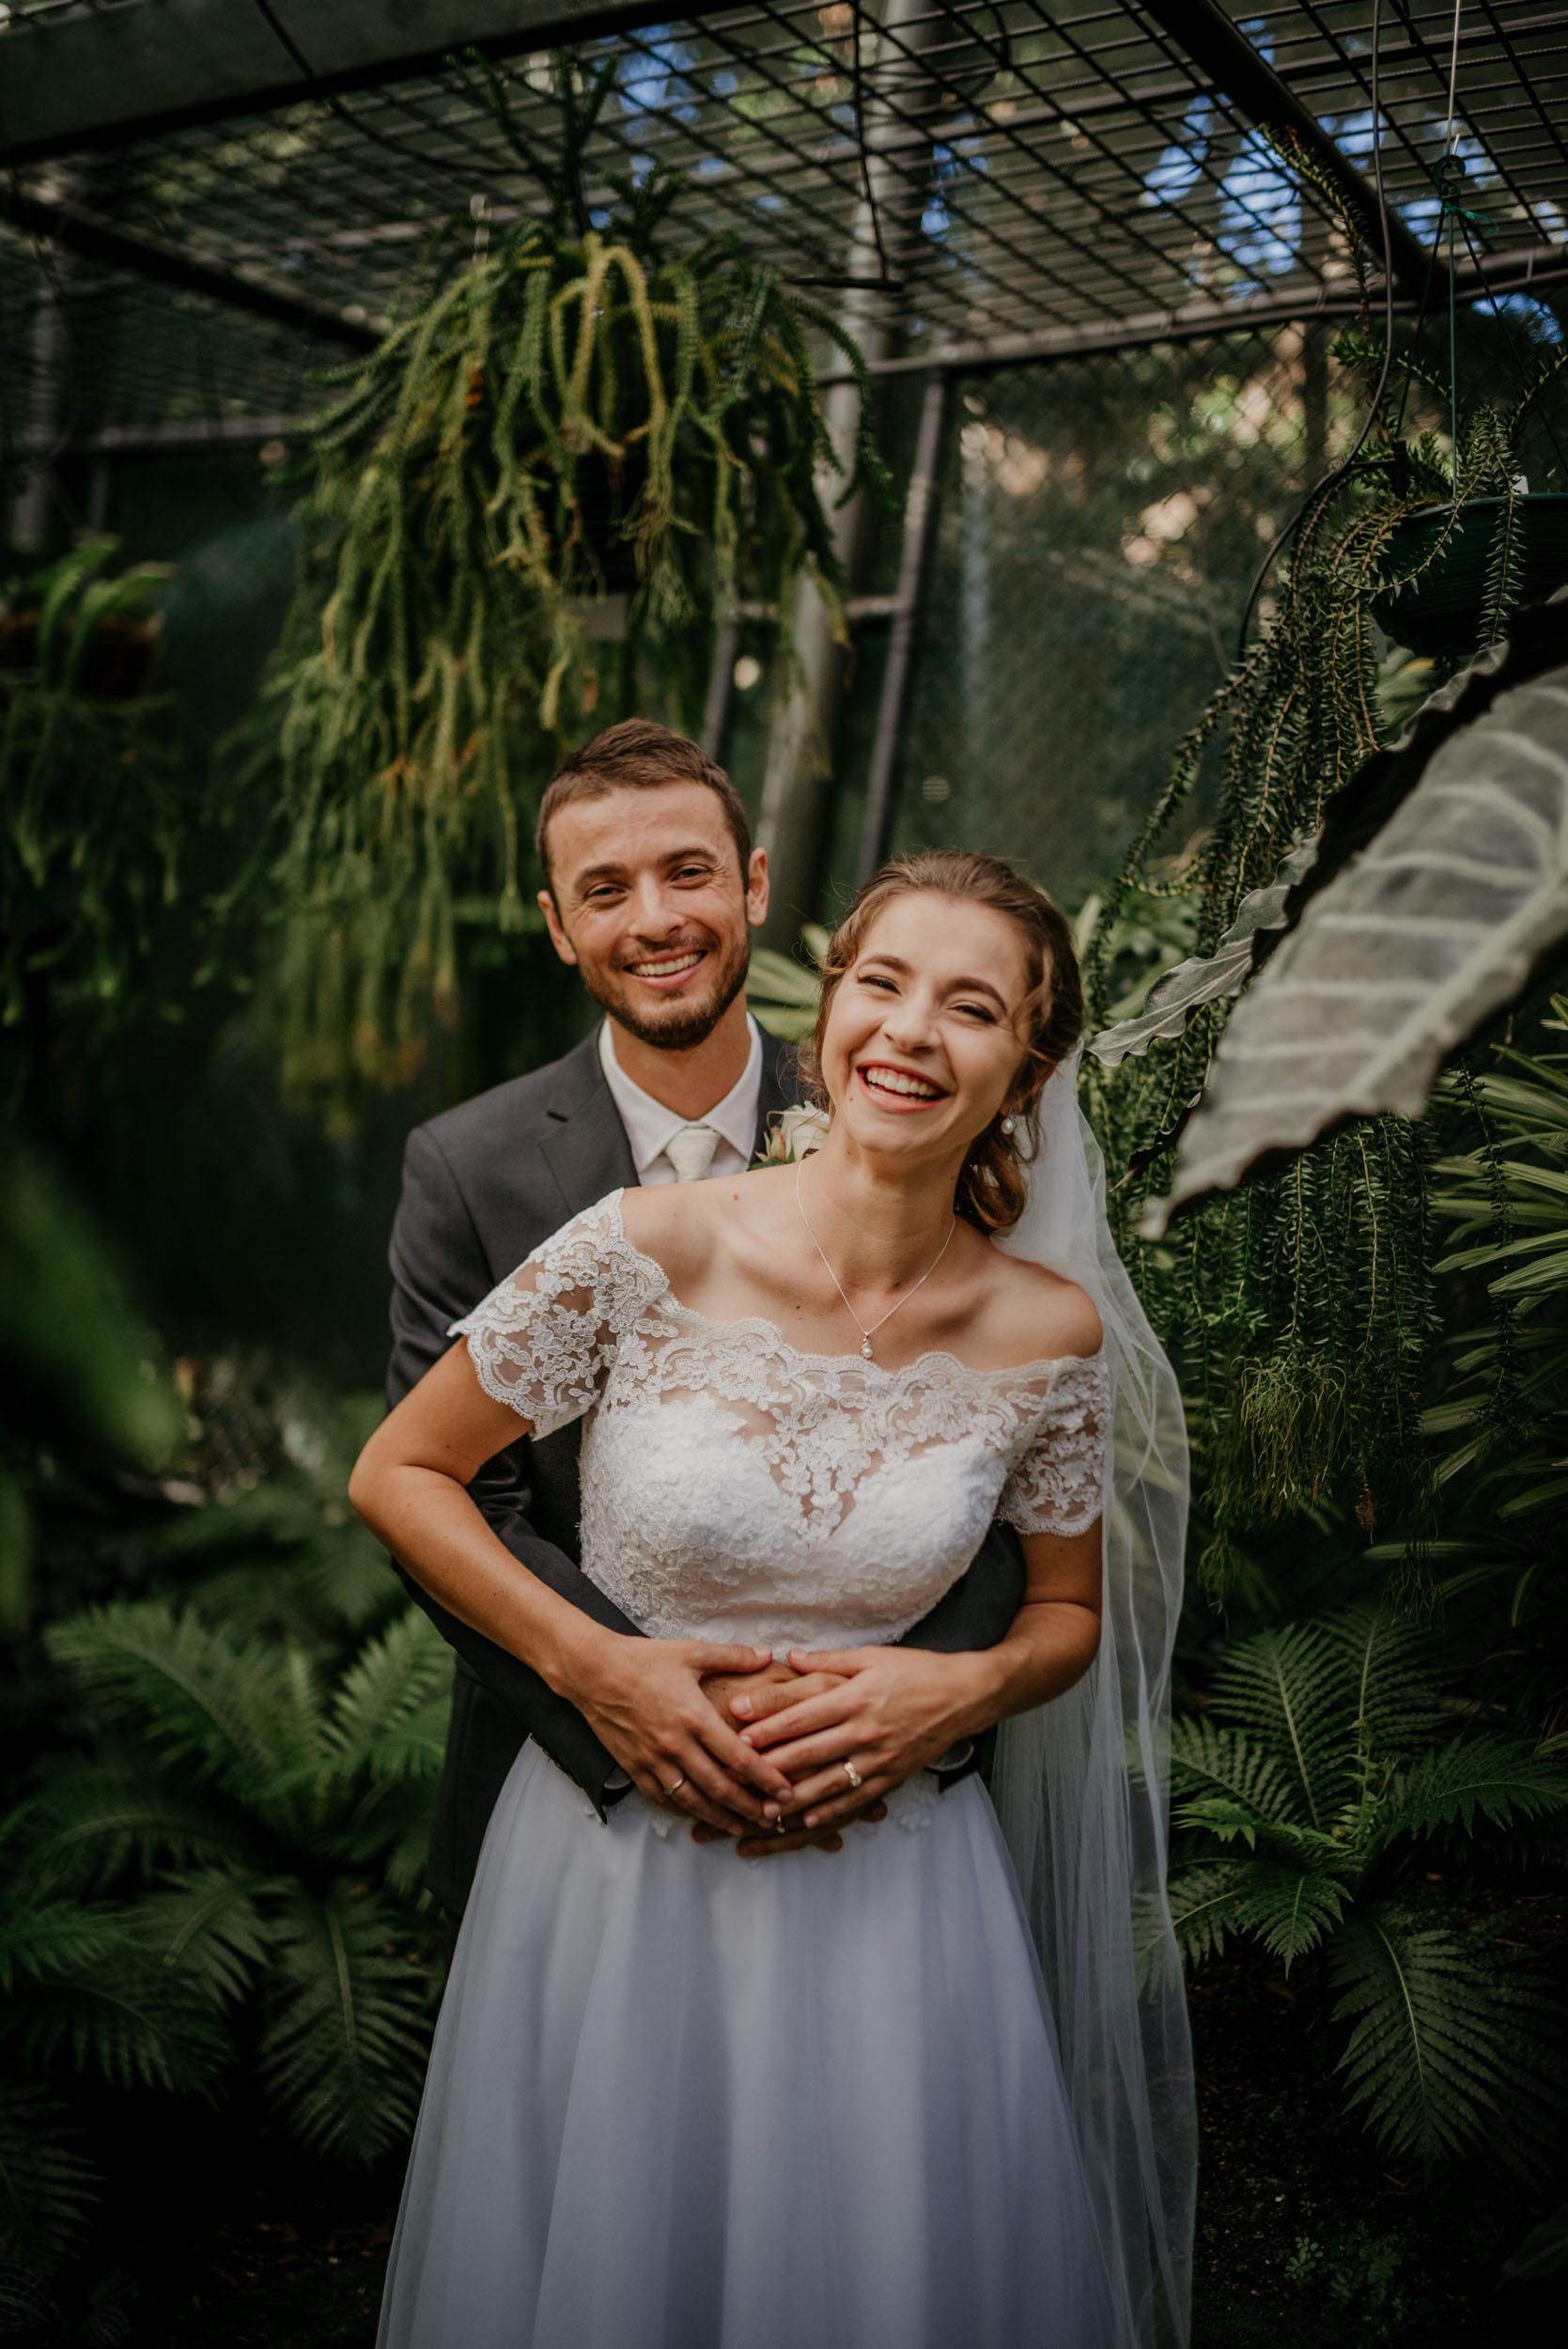 The Raw Photographer - Cairns and Port Douglas Wedding Photographer - Best of 2018-33.jpg